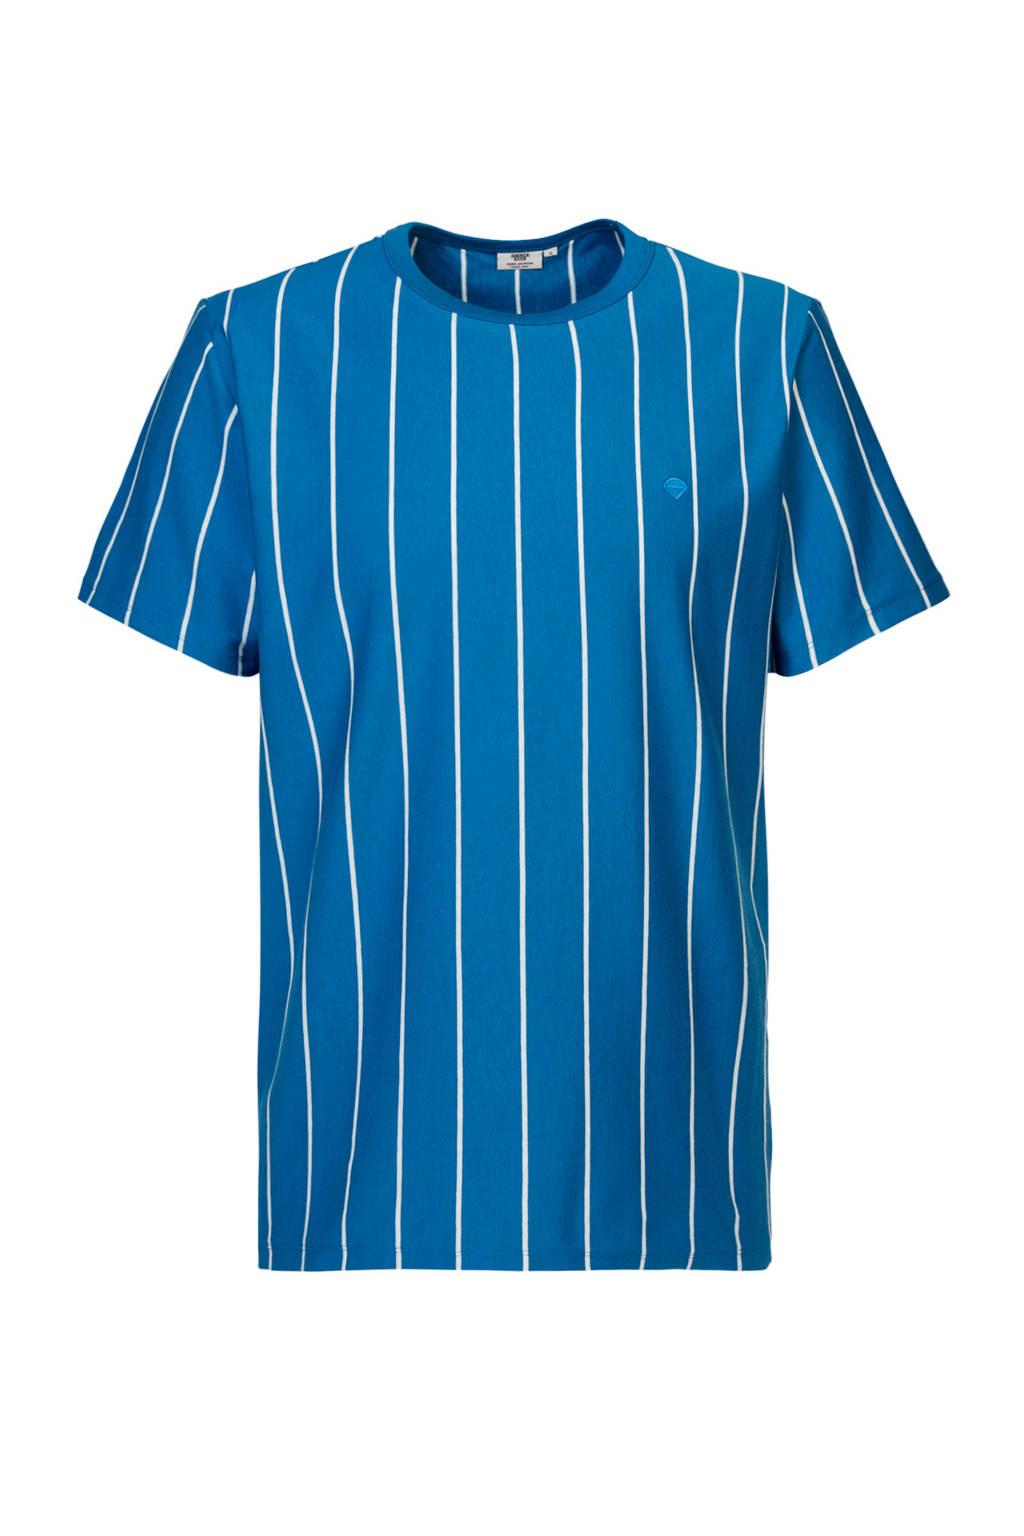 America Today gestreept T-shirt blue